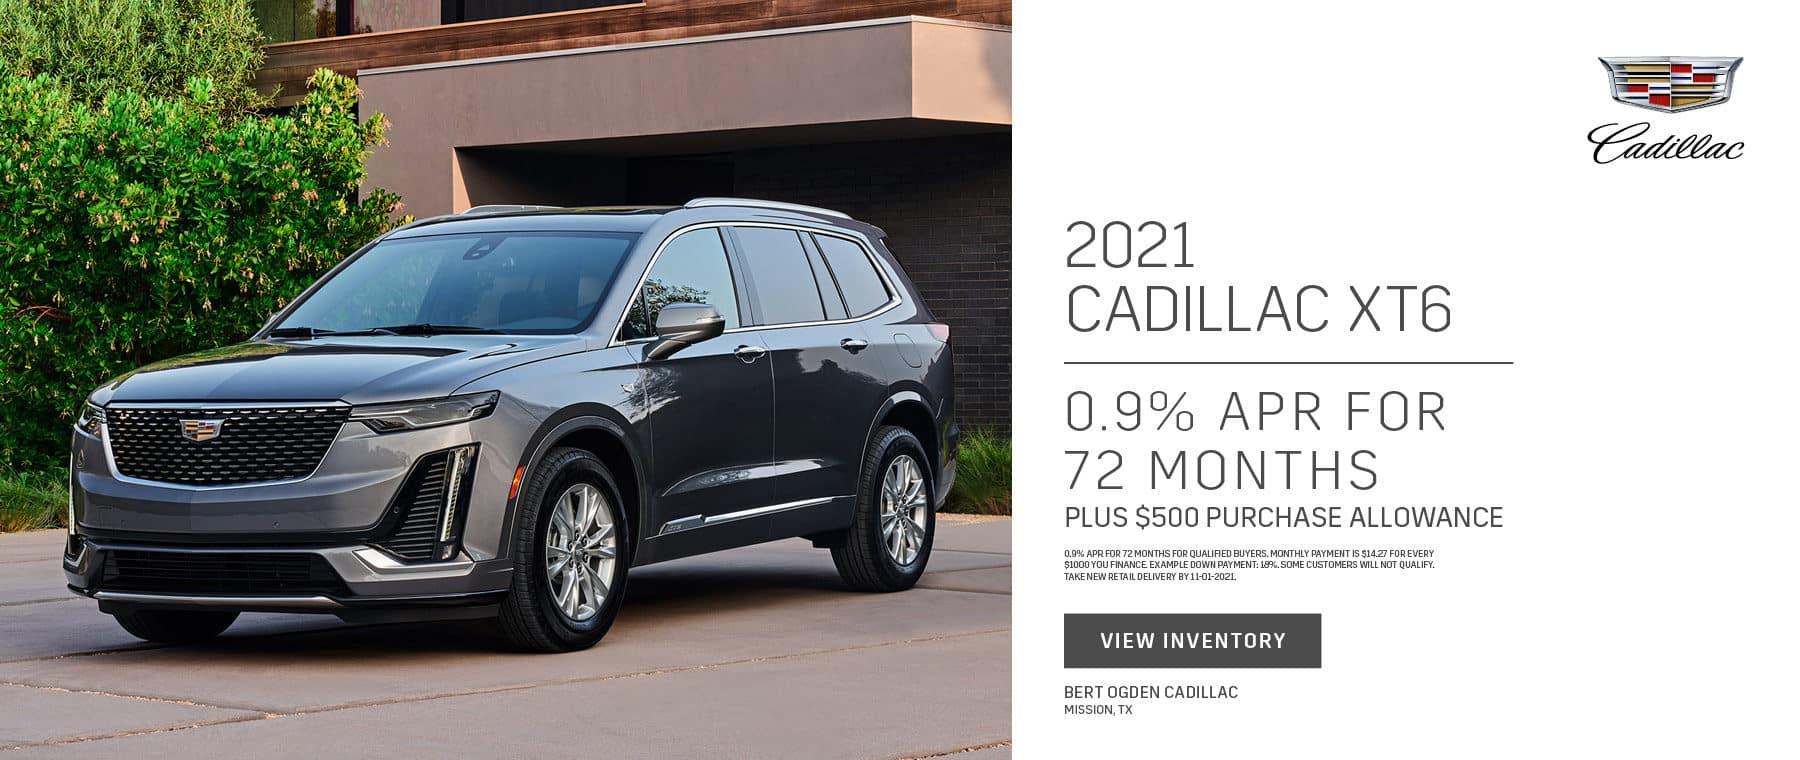 2021 Cadillac XT6 Offer   Bert Ogden Cadillac in Mission, Texas